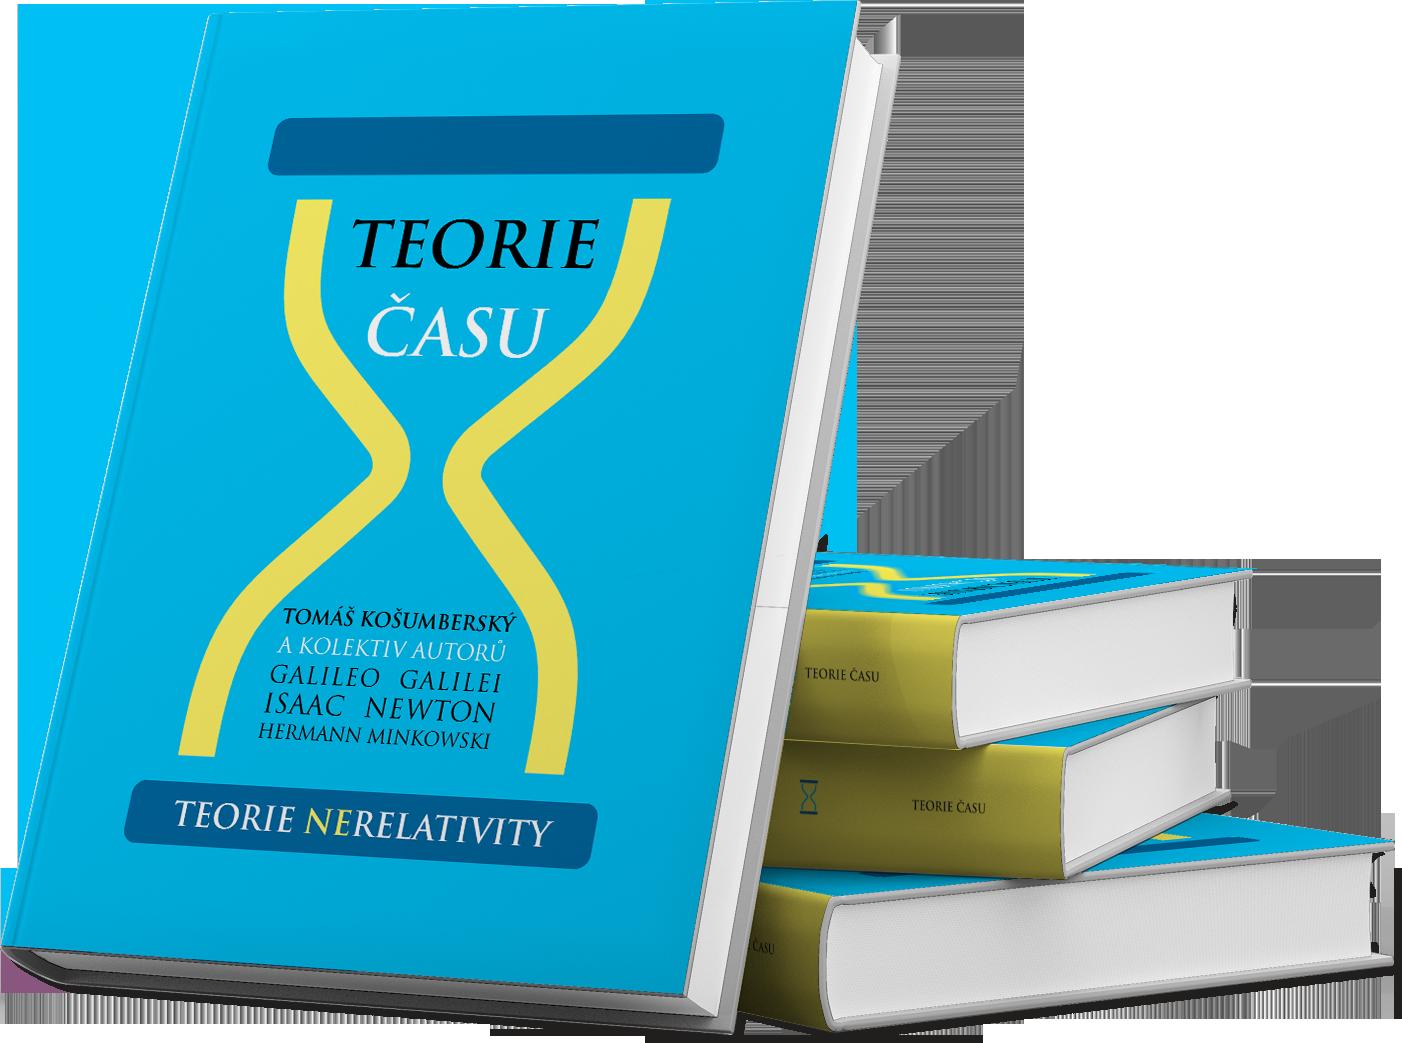 teorie času- teorie nerelativity